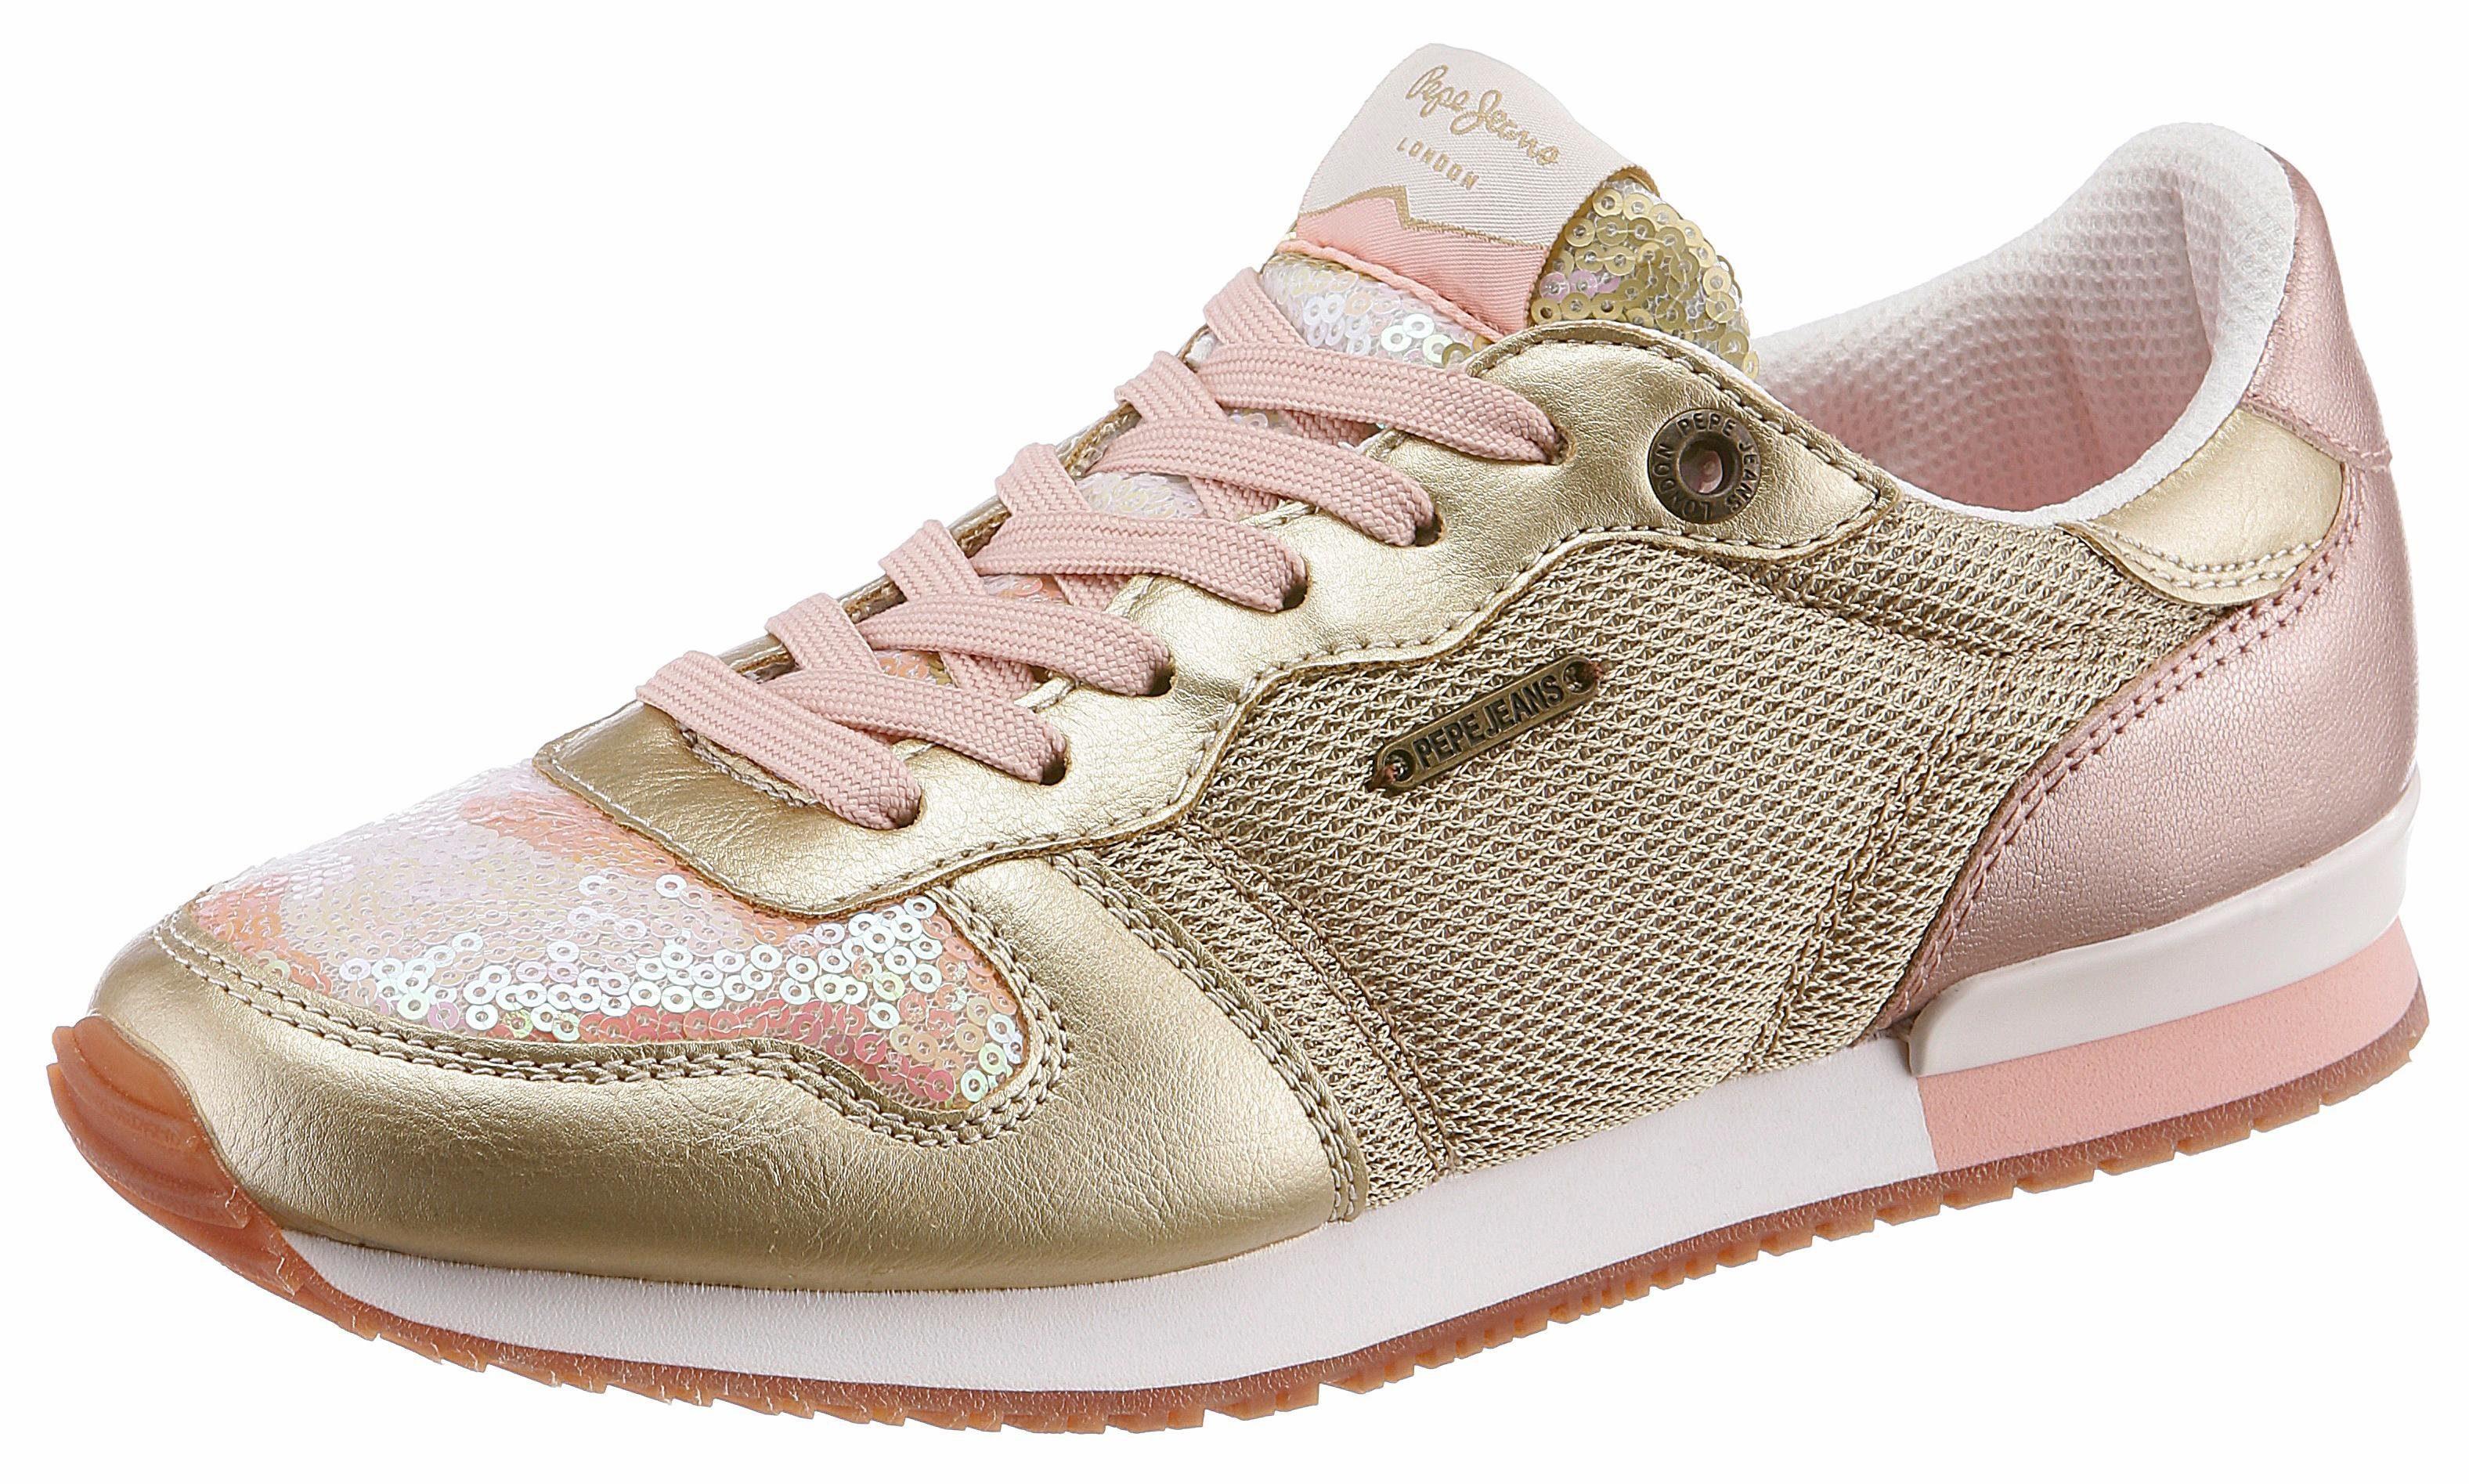 Pepe Jeans GABLE SEQUINS Sneaker, mit schimmernden Pailletten online kaufen  goldfarben-rosé